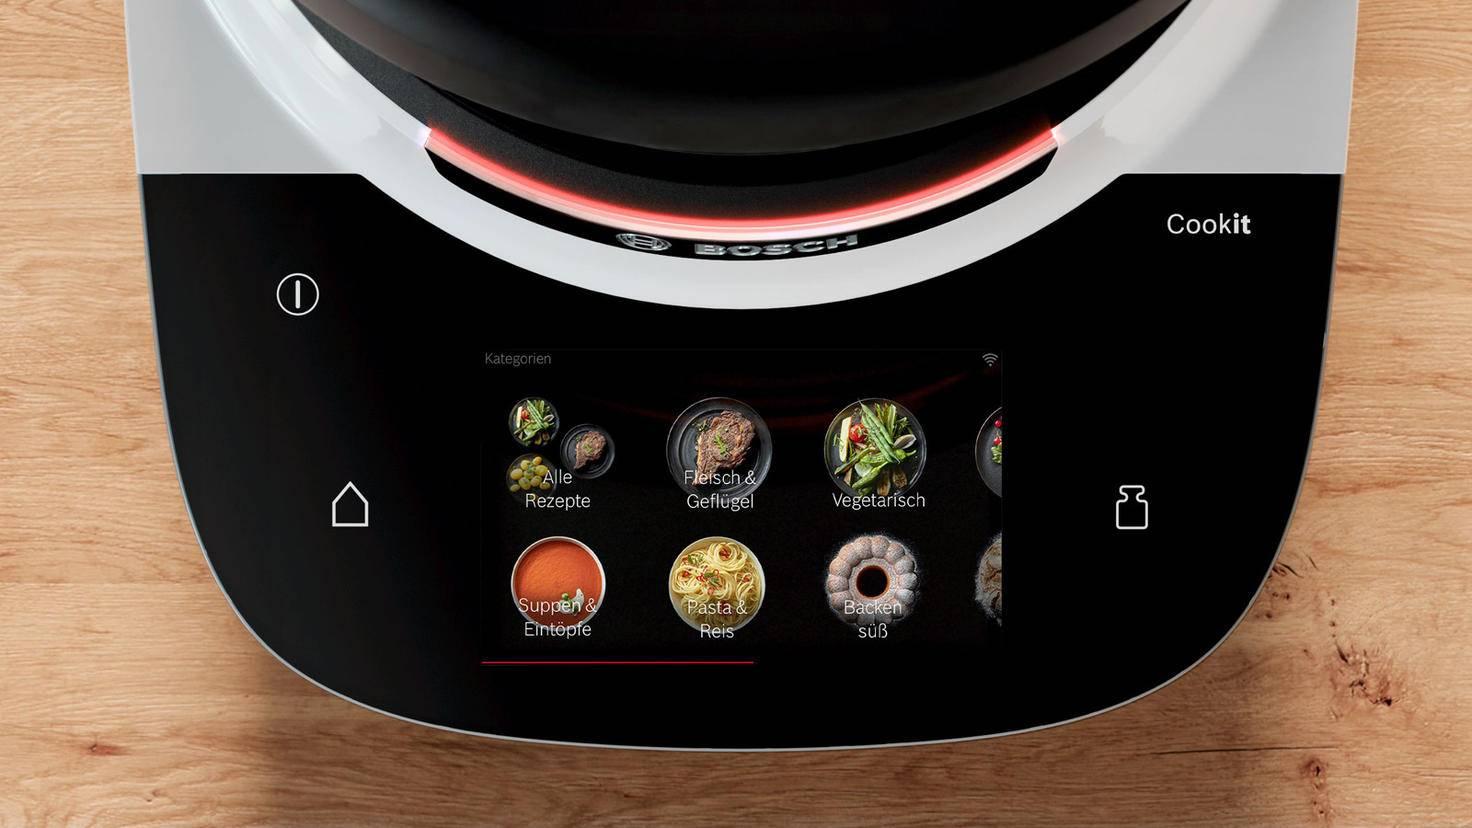 Bosch Cookit-Küchenmaschine-Kochen-Bosch